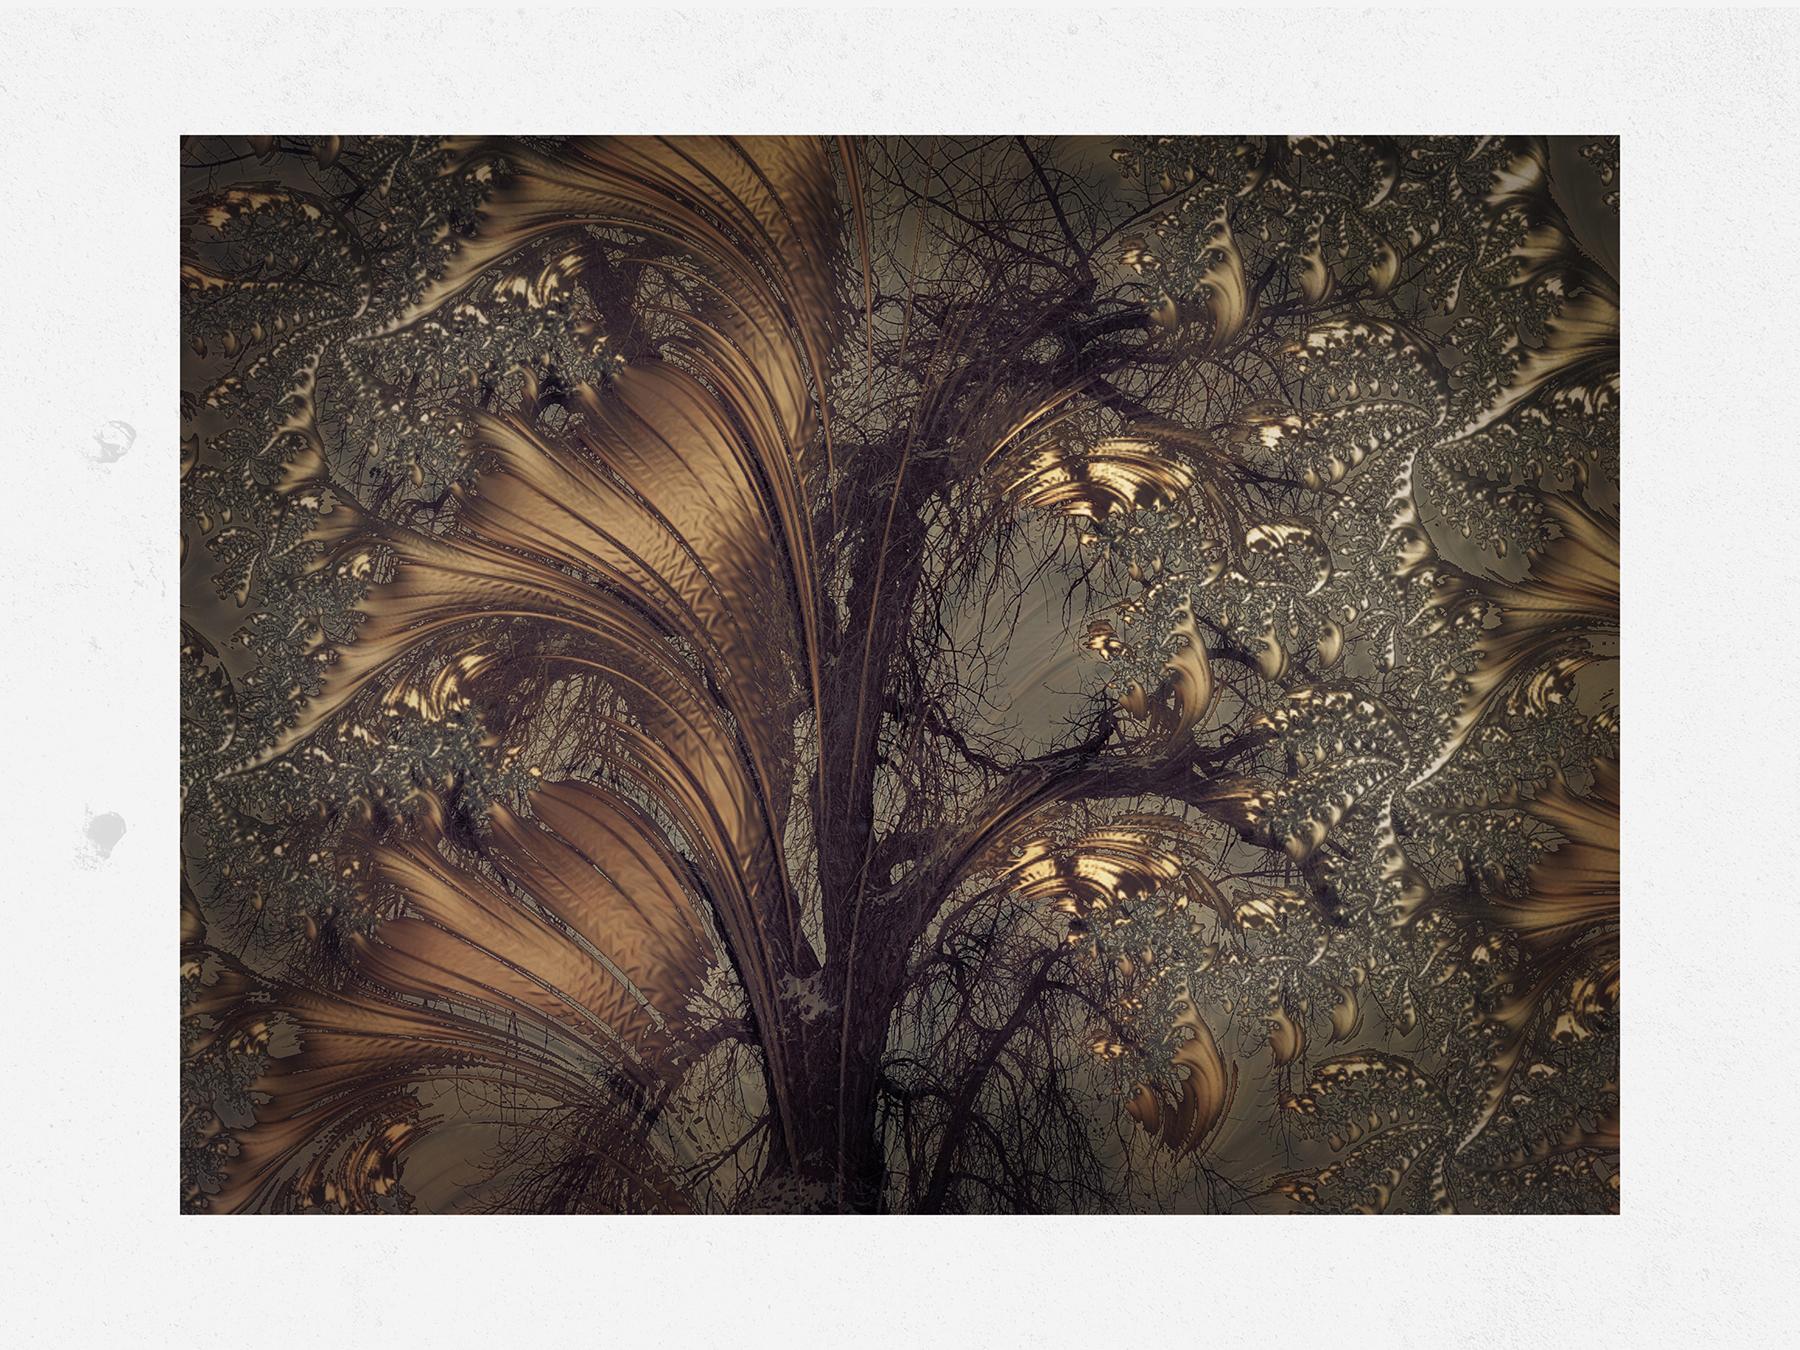 Kate_Zari Roberts_Nature Fractals_Tree Fractal_3.jpg